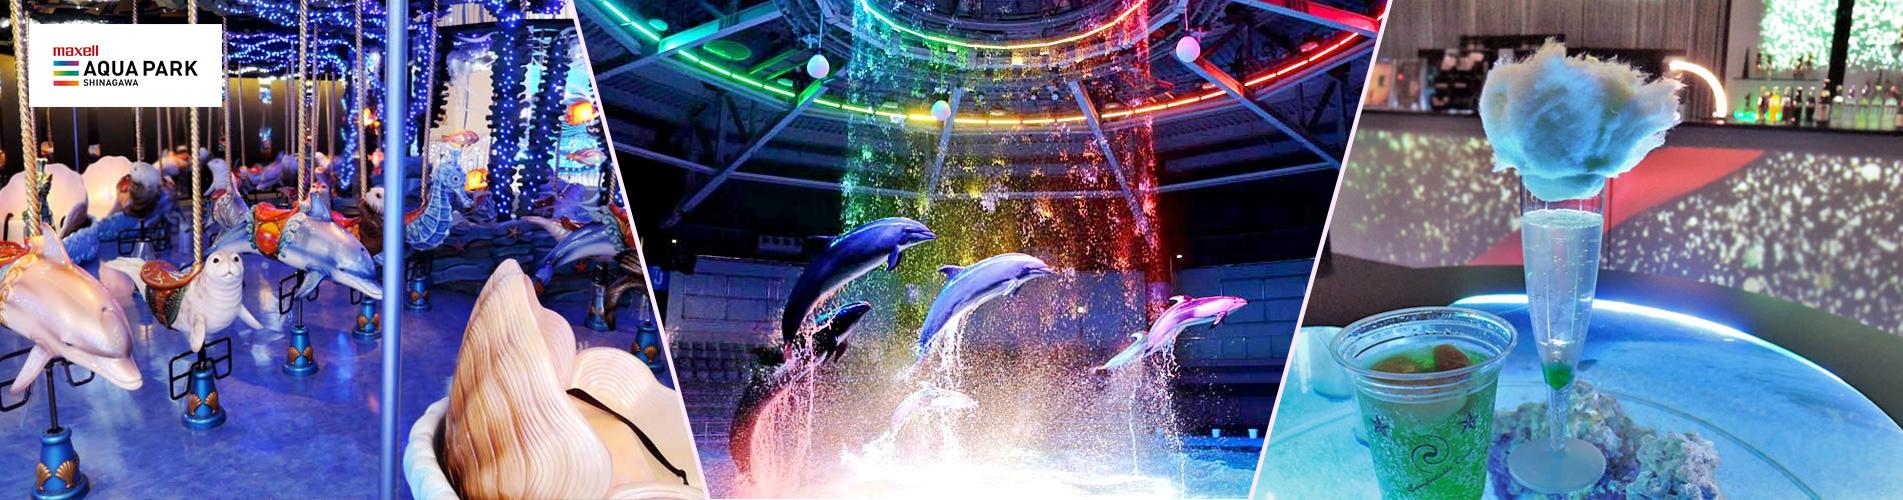 東京品川水族館門票 Maxell Aqua Park Tokyo